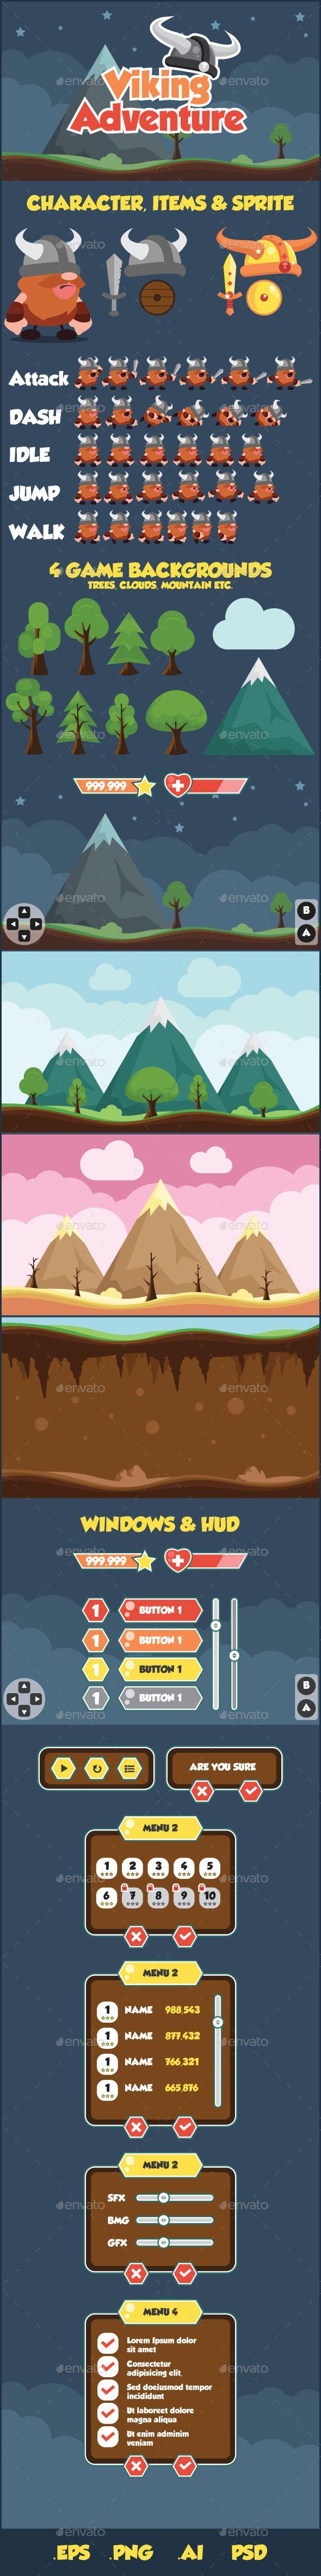 Viking Adventure Sidescroller Game UI - Game Kits Game Assets